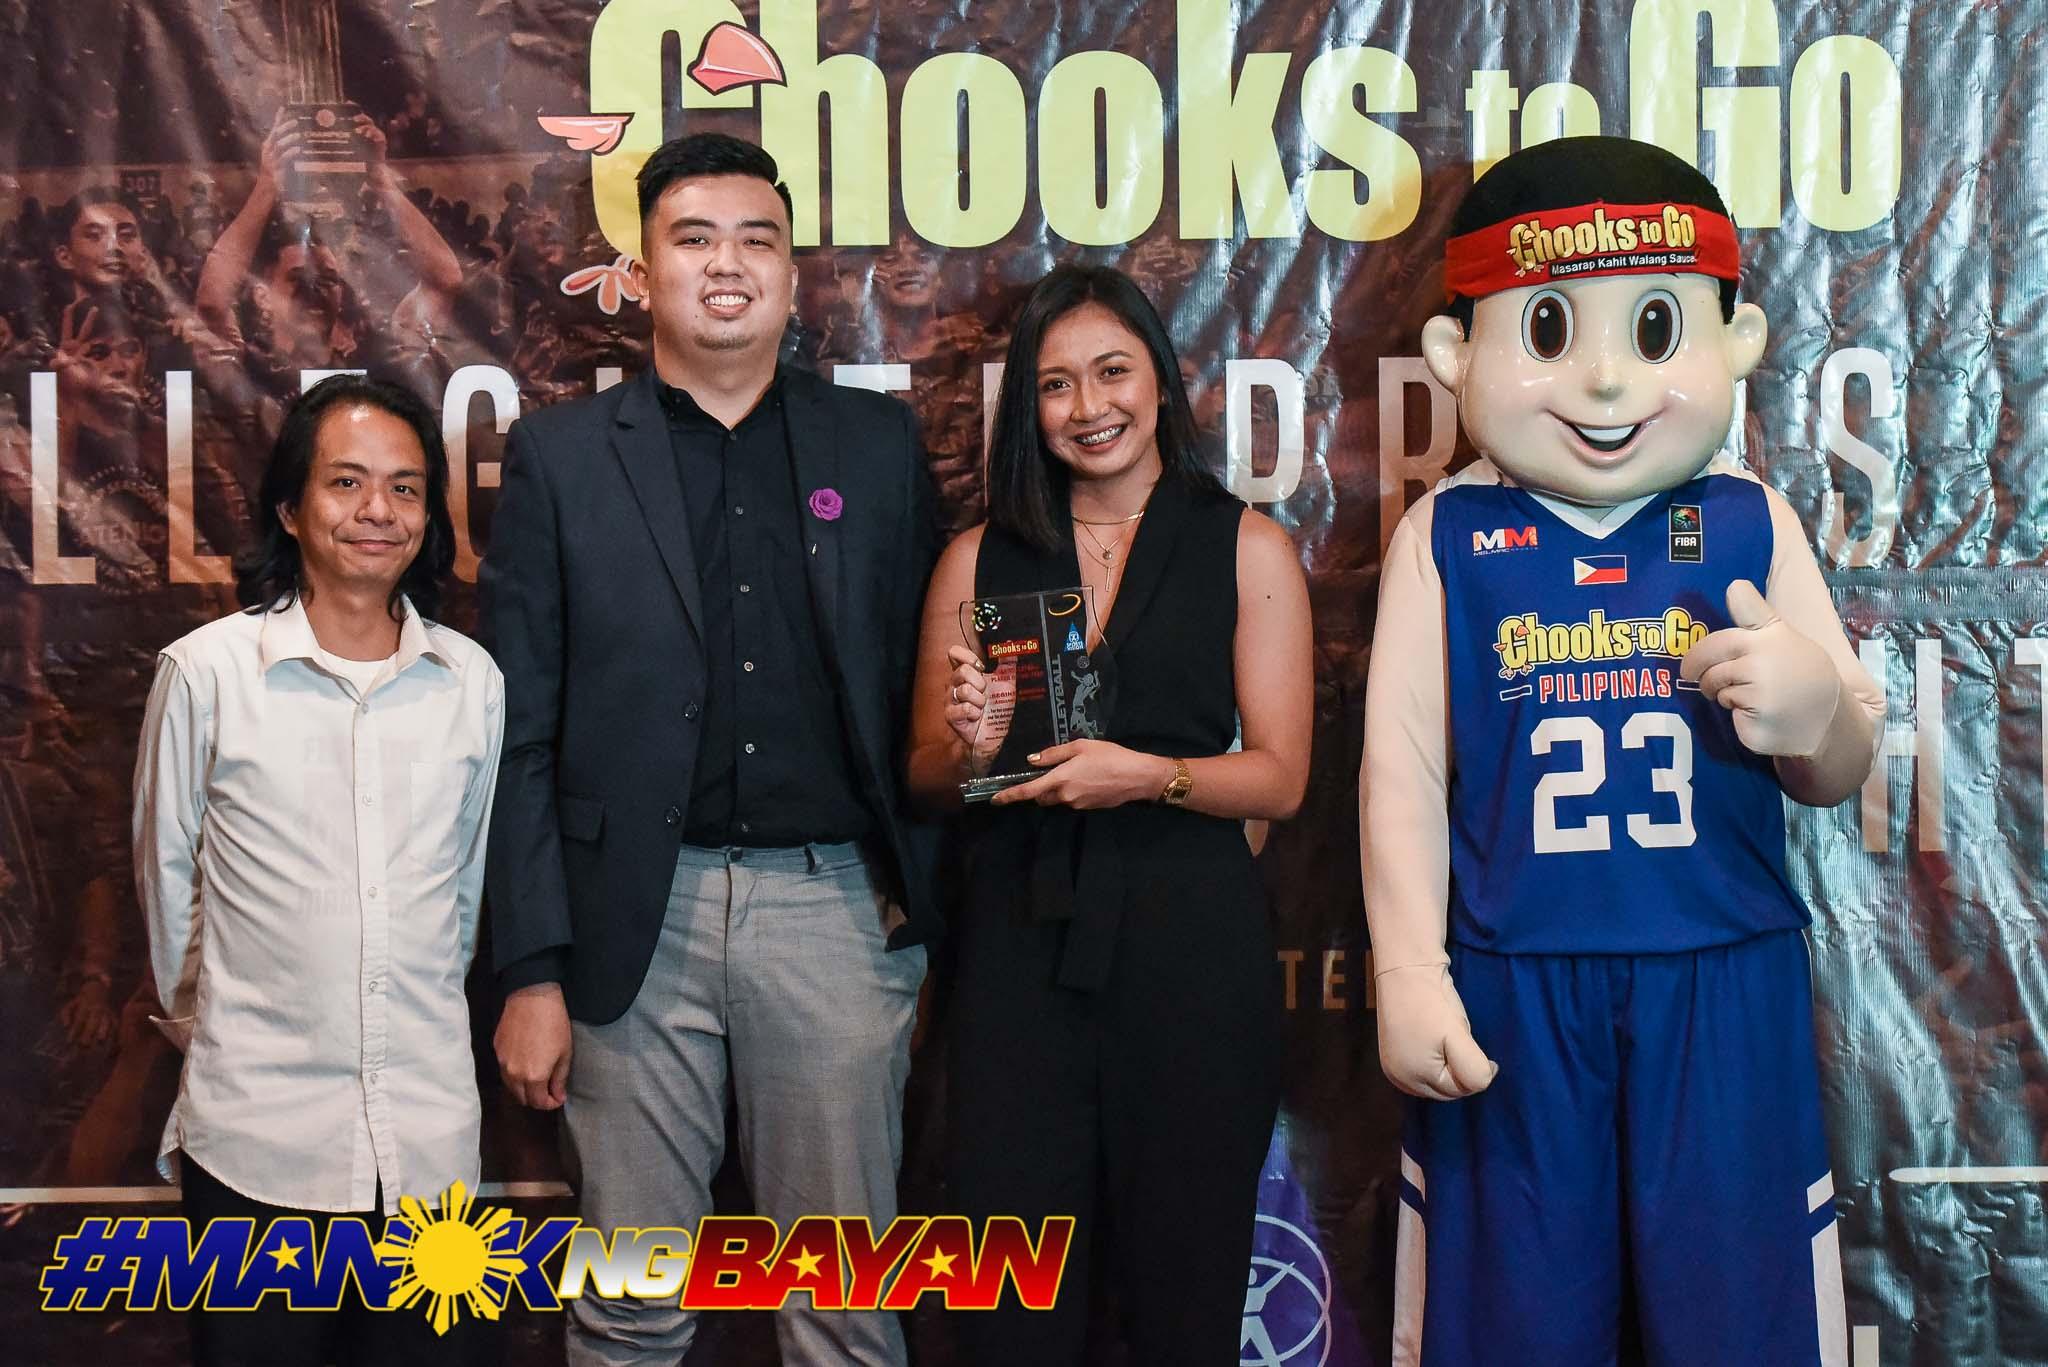 2019-Collegiate-Sports-Awards-Regine-Arocha Heartbroken Regine Arocha hangs Arellano Lady Chiefs jersey for good AU NCAA News Volleyball  - philippine sports news